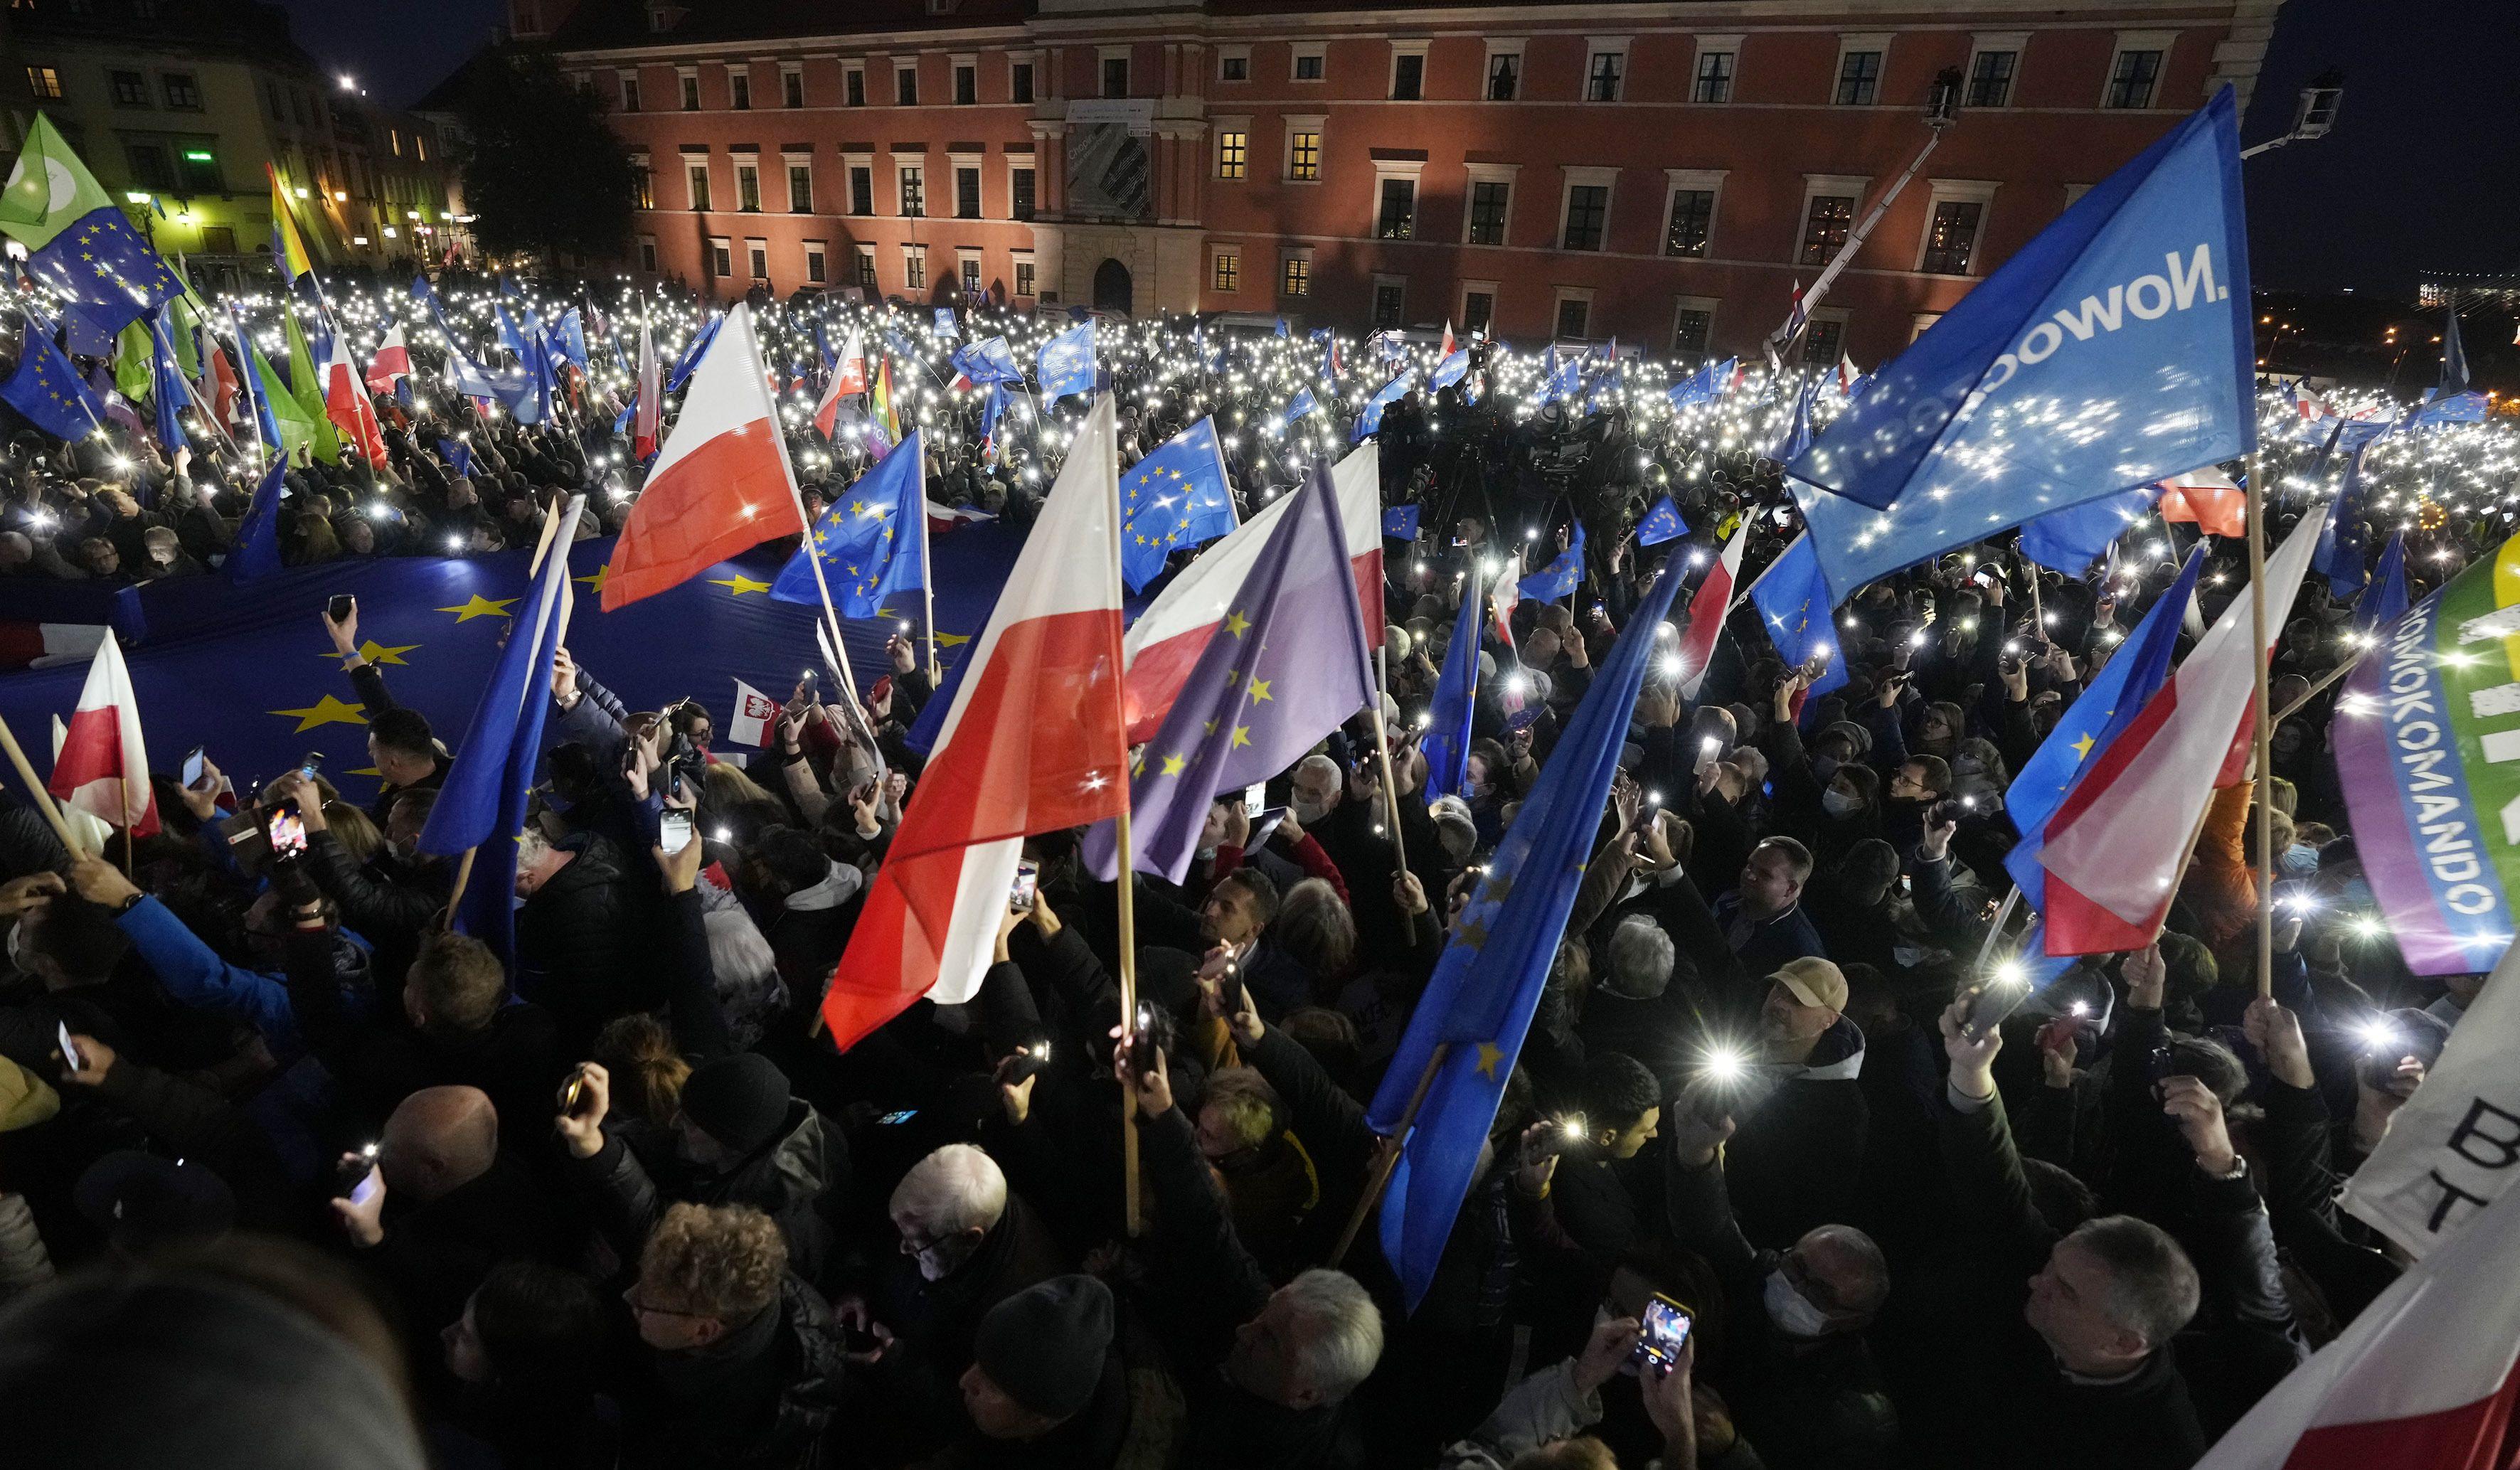 sobrino de primer ministro detenido en protesta en polonia